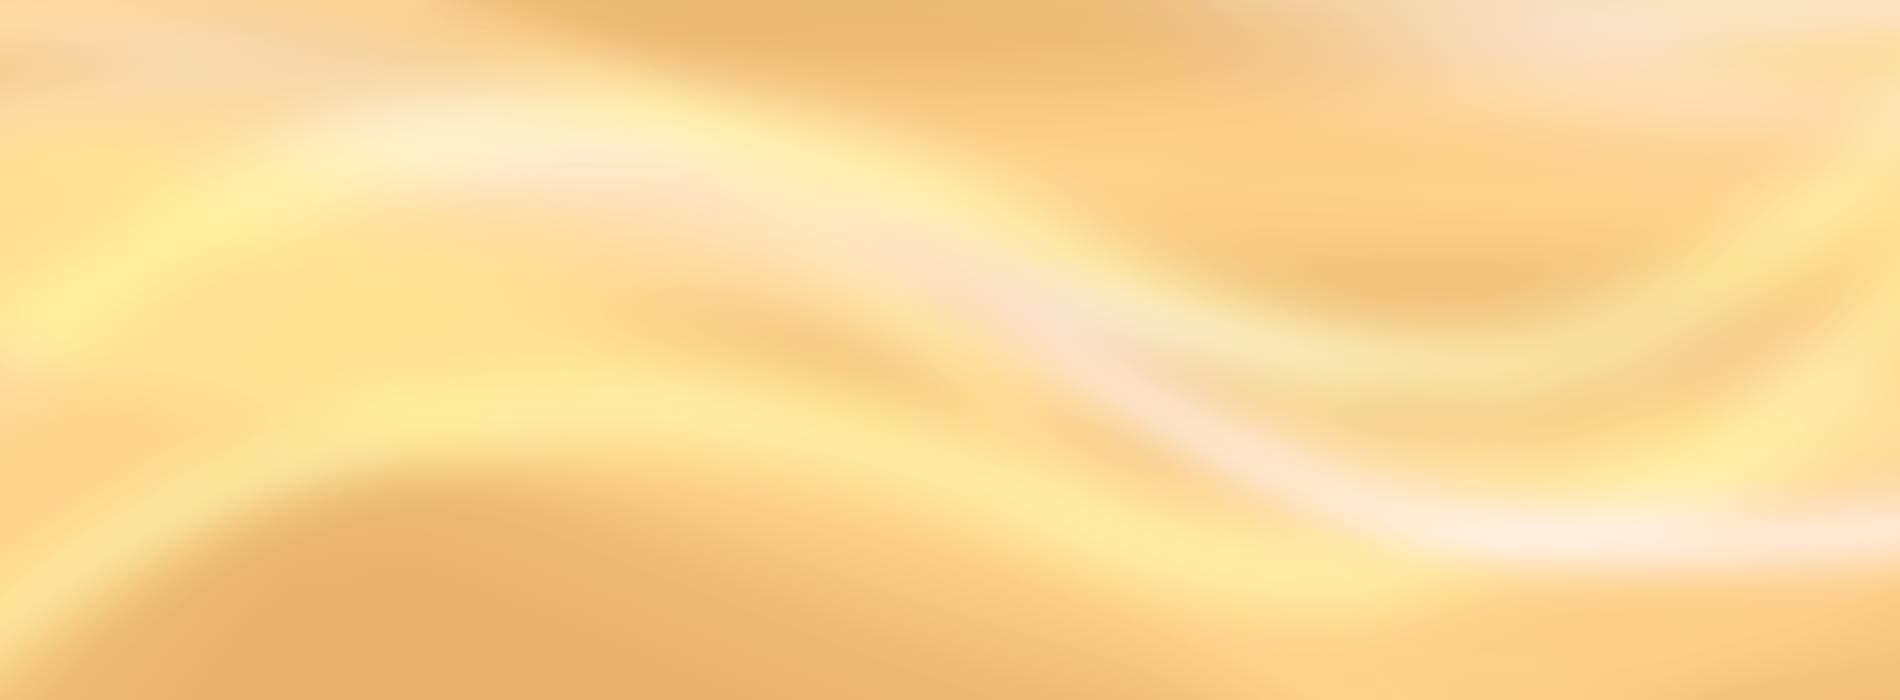 Slider-Titelseite3